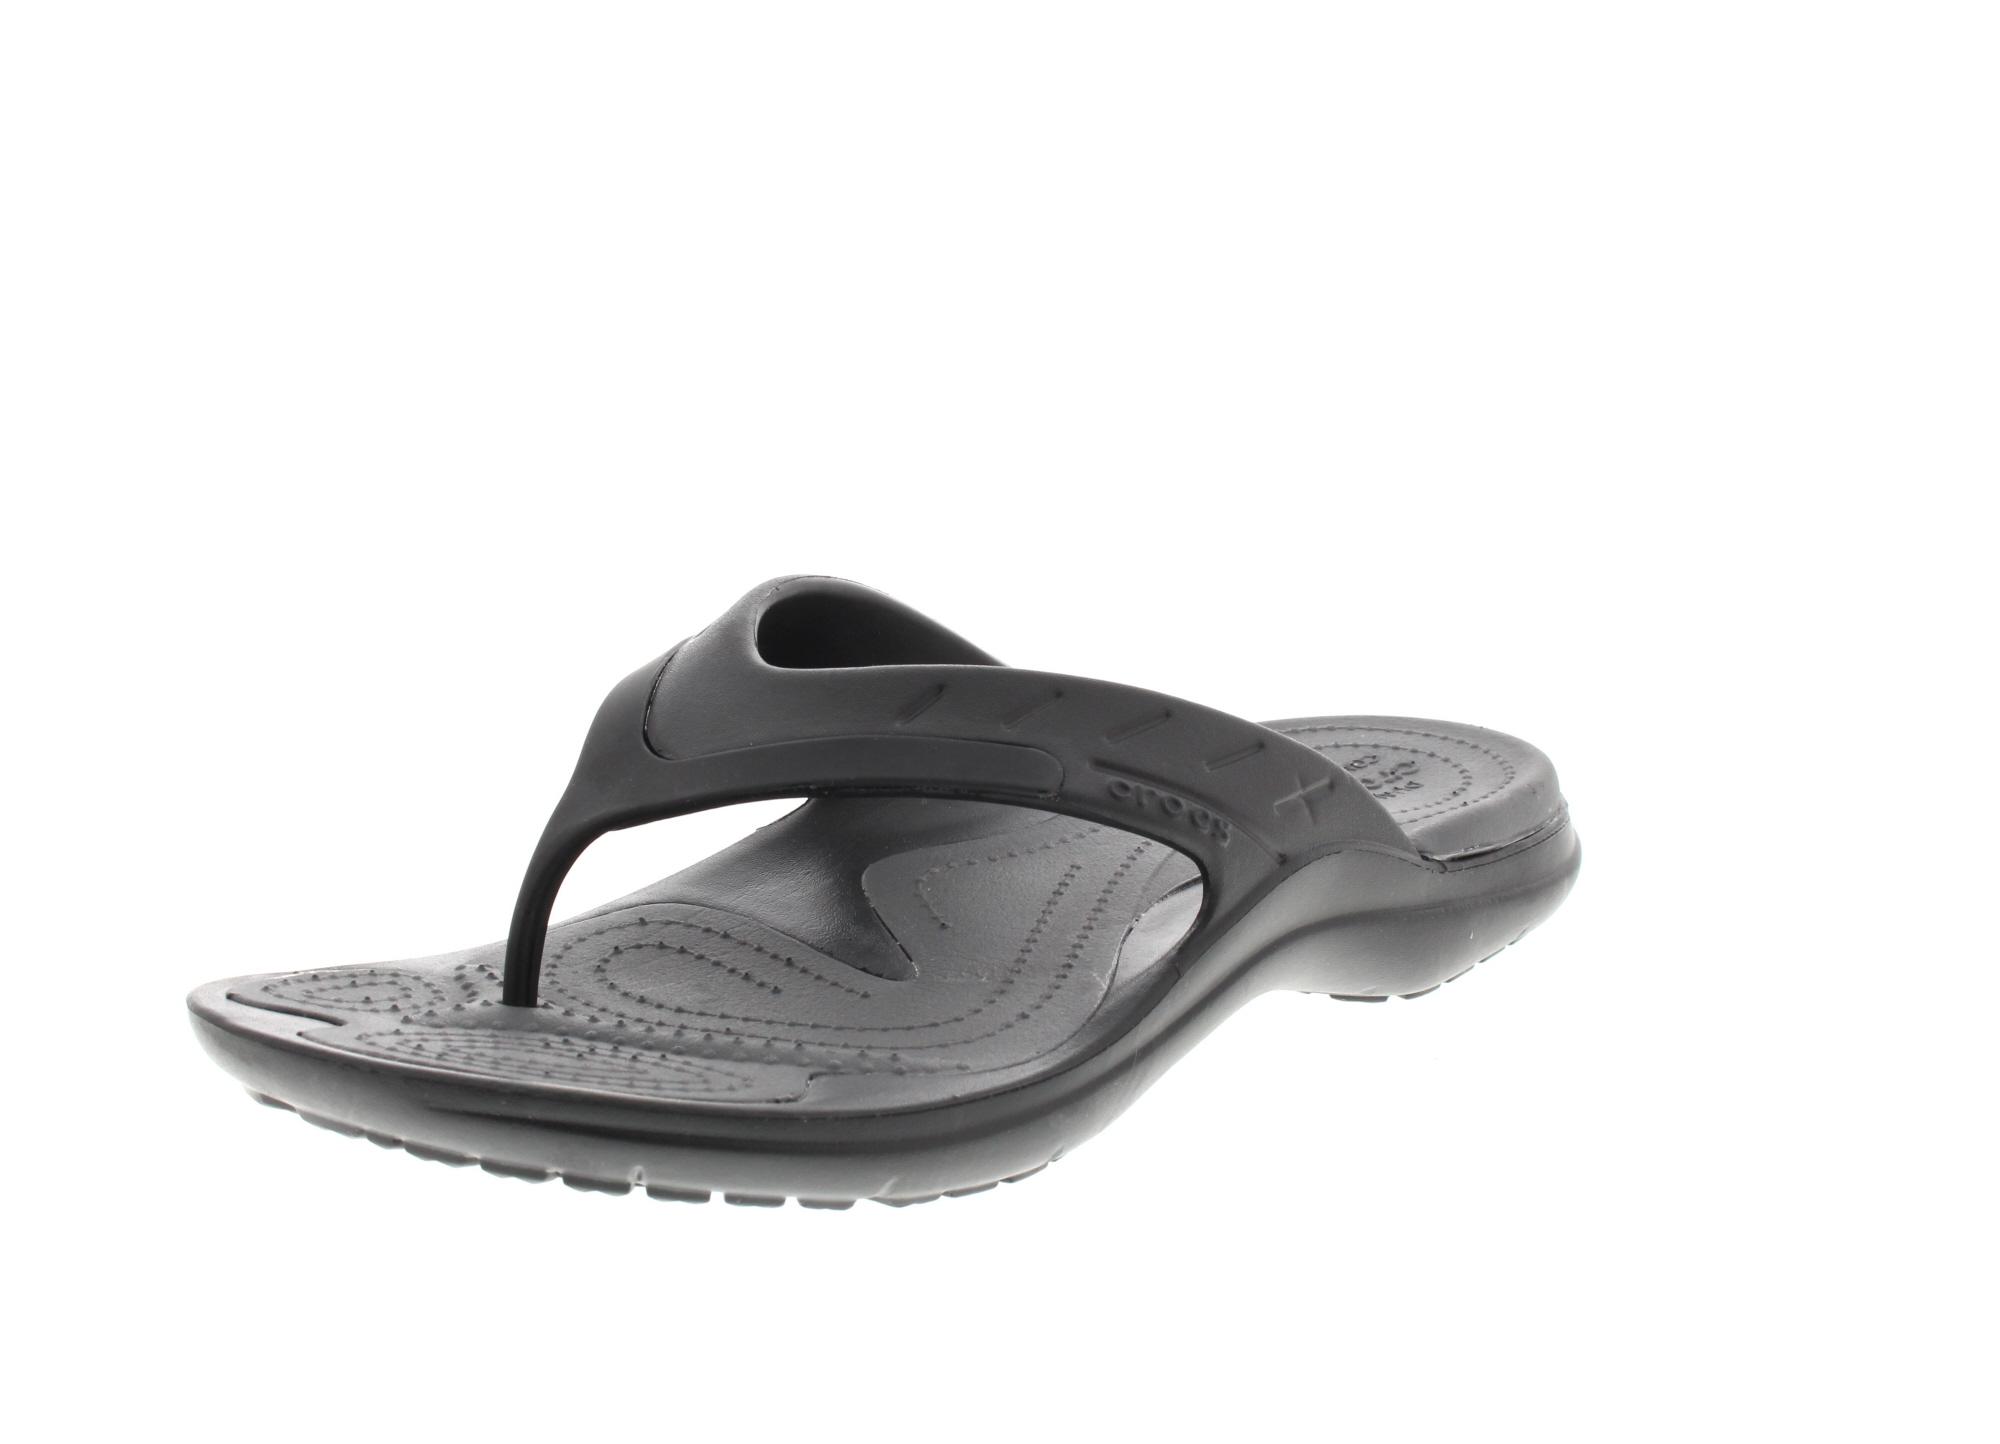 CROCS Zehentrenner - MODI SPORT FLIP - black graphite0